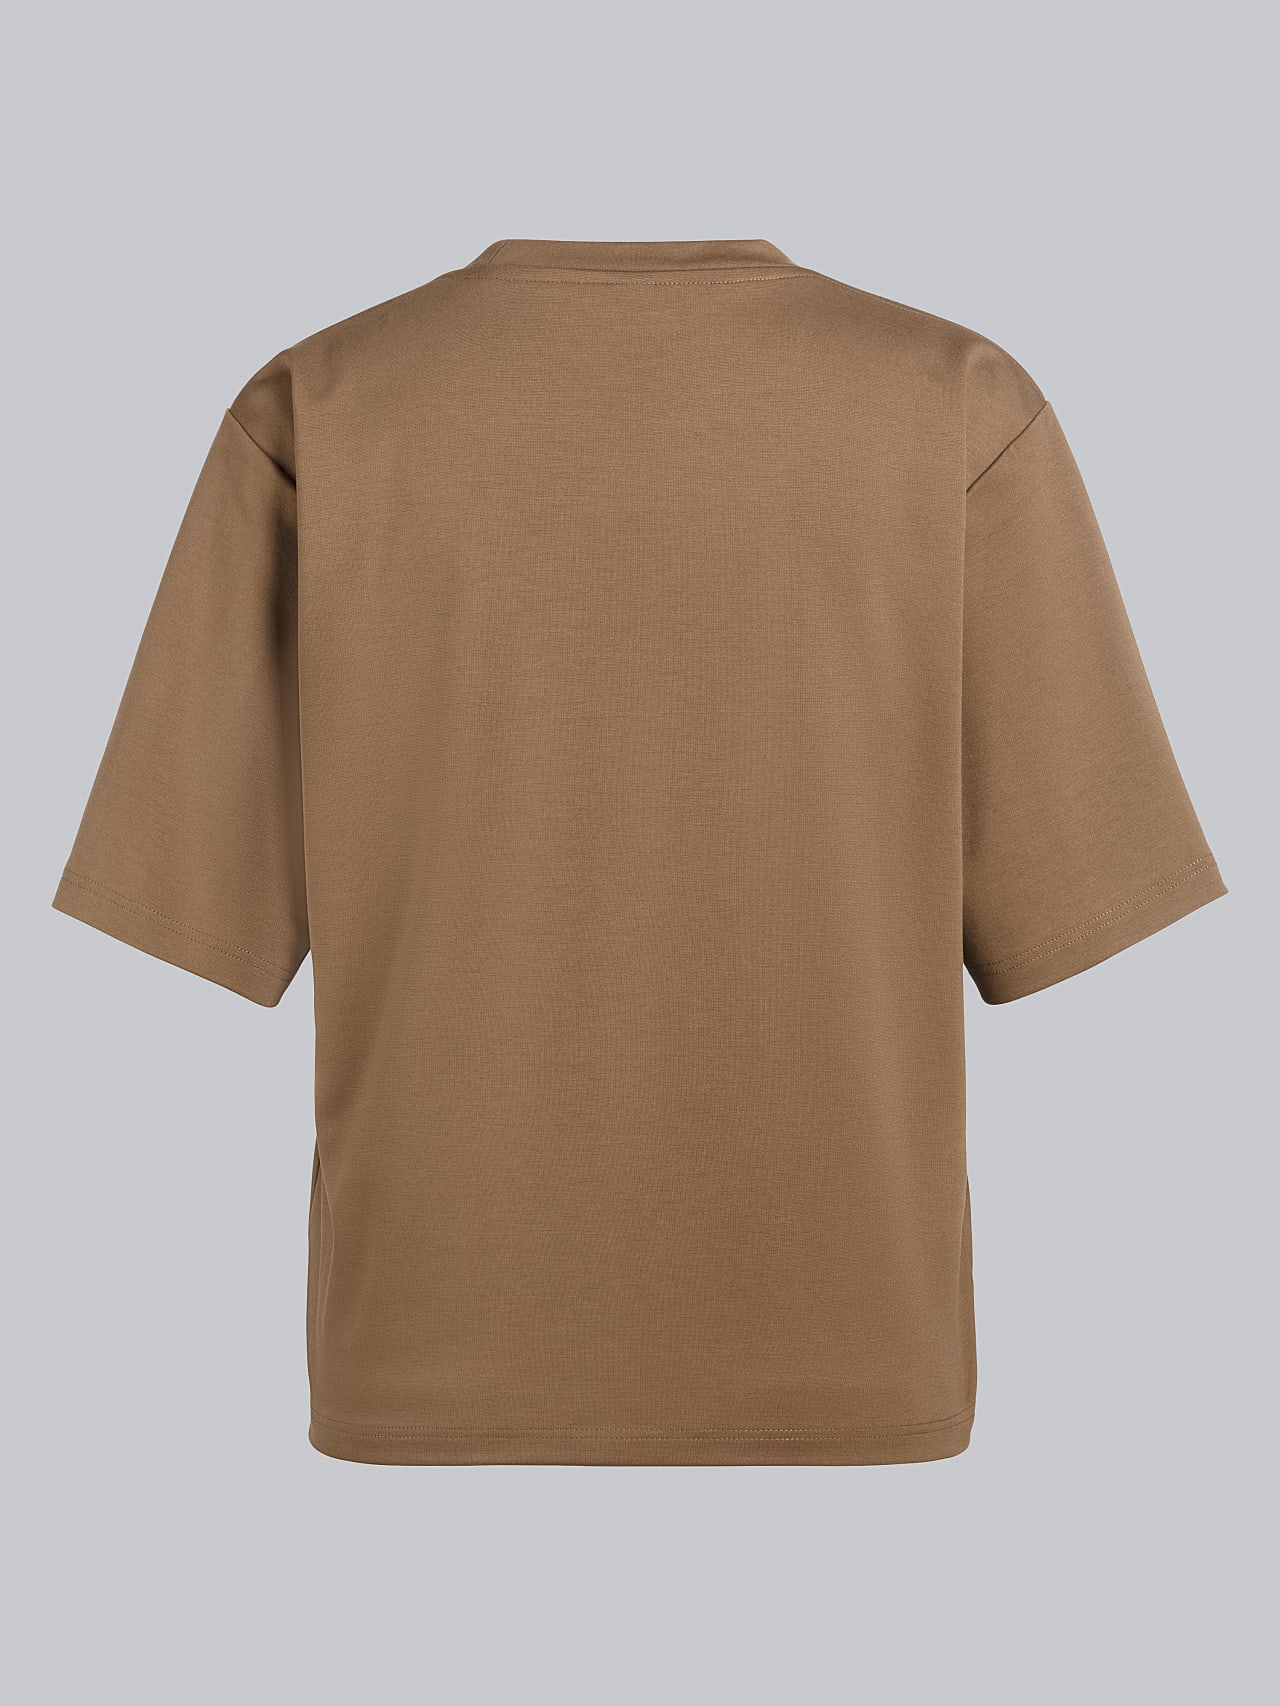 JASHU V1.Y5.02 Heavy-Weight Logo T-Shirt gold Left Alpha Tauri